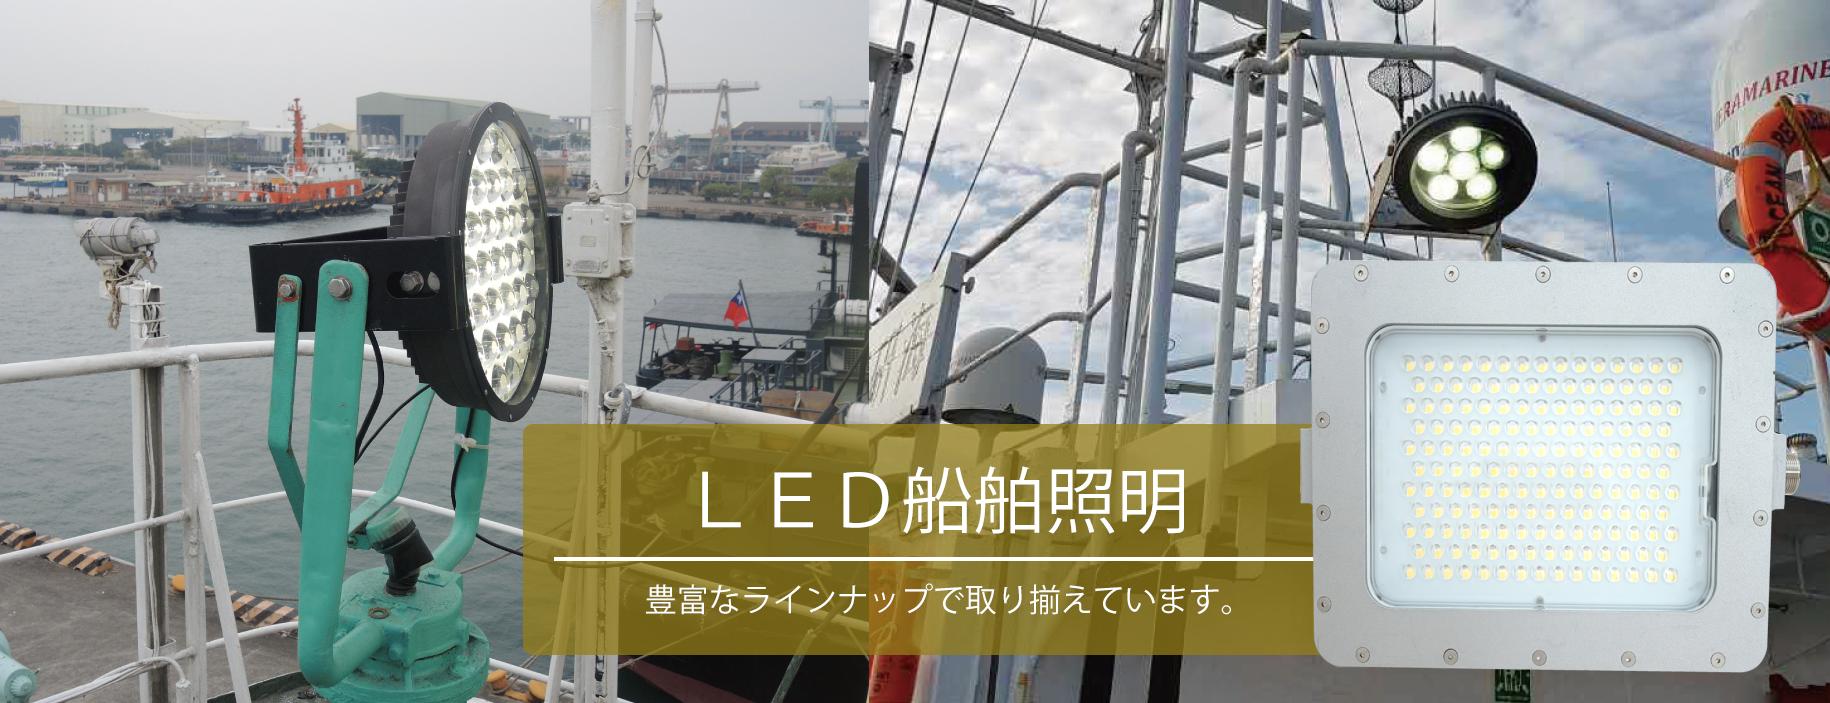 LED船舶照明